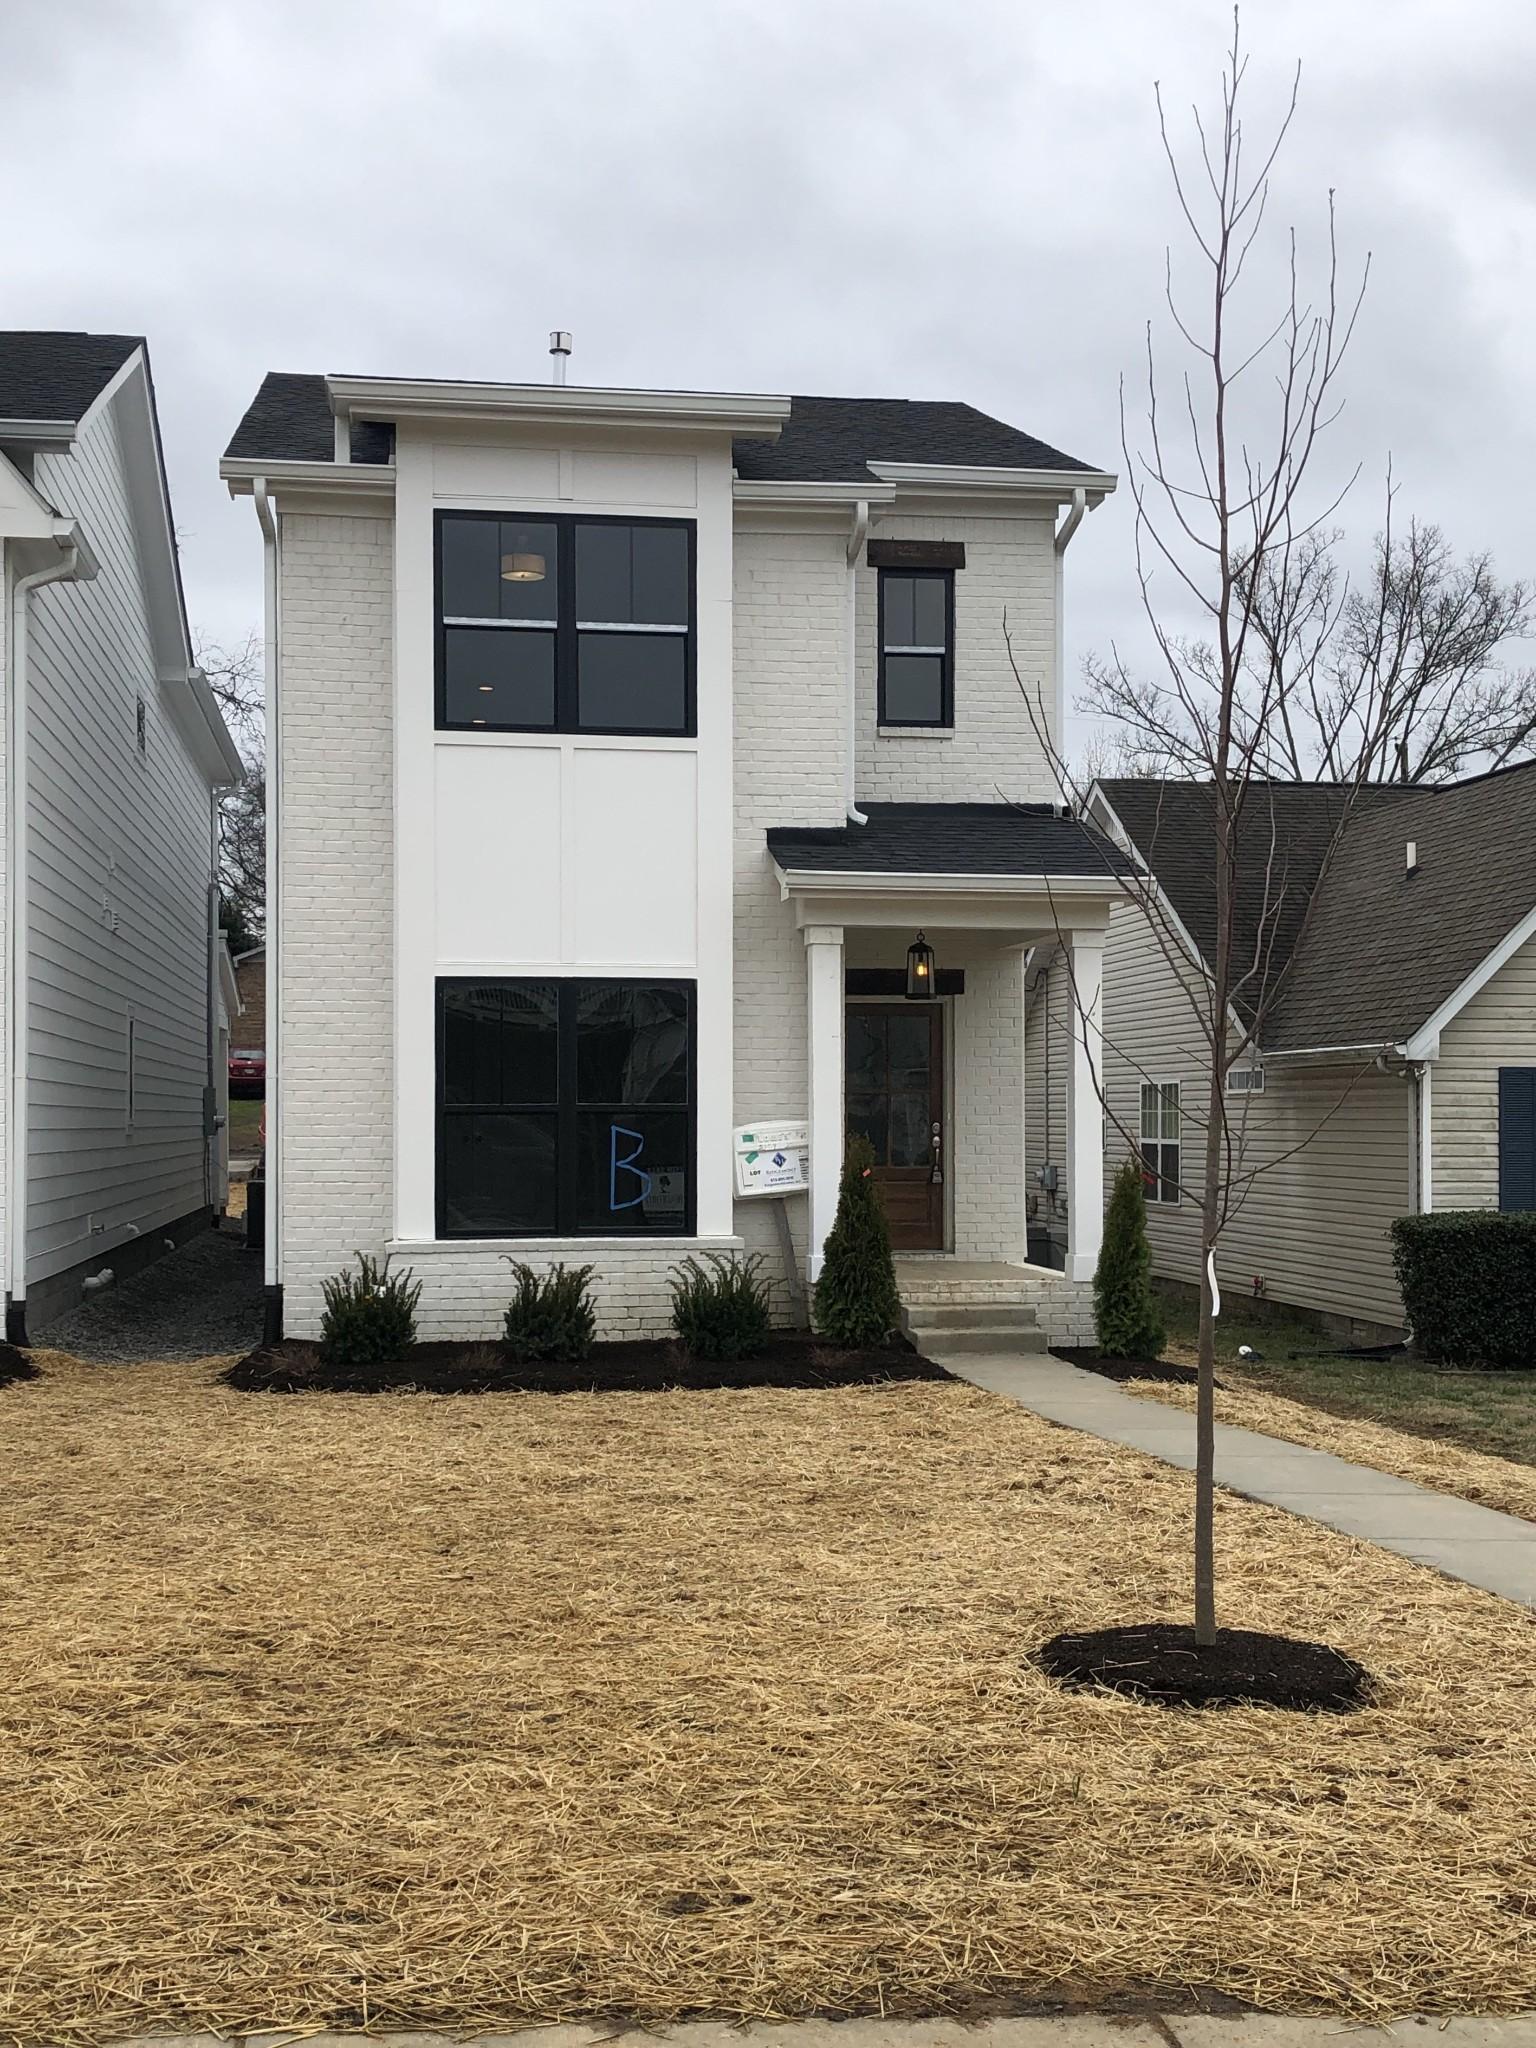 5109B Illinois Ave, Nashville, TN 37209 - Nashville, TN real estate listing